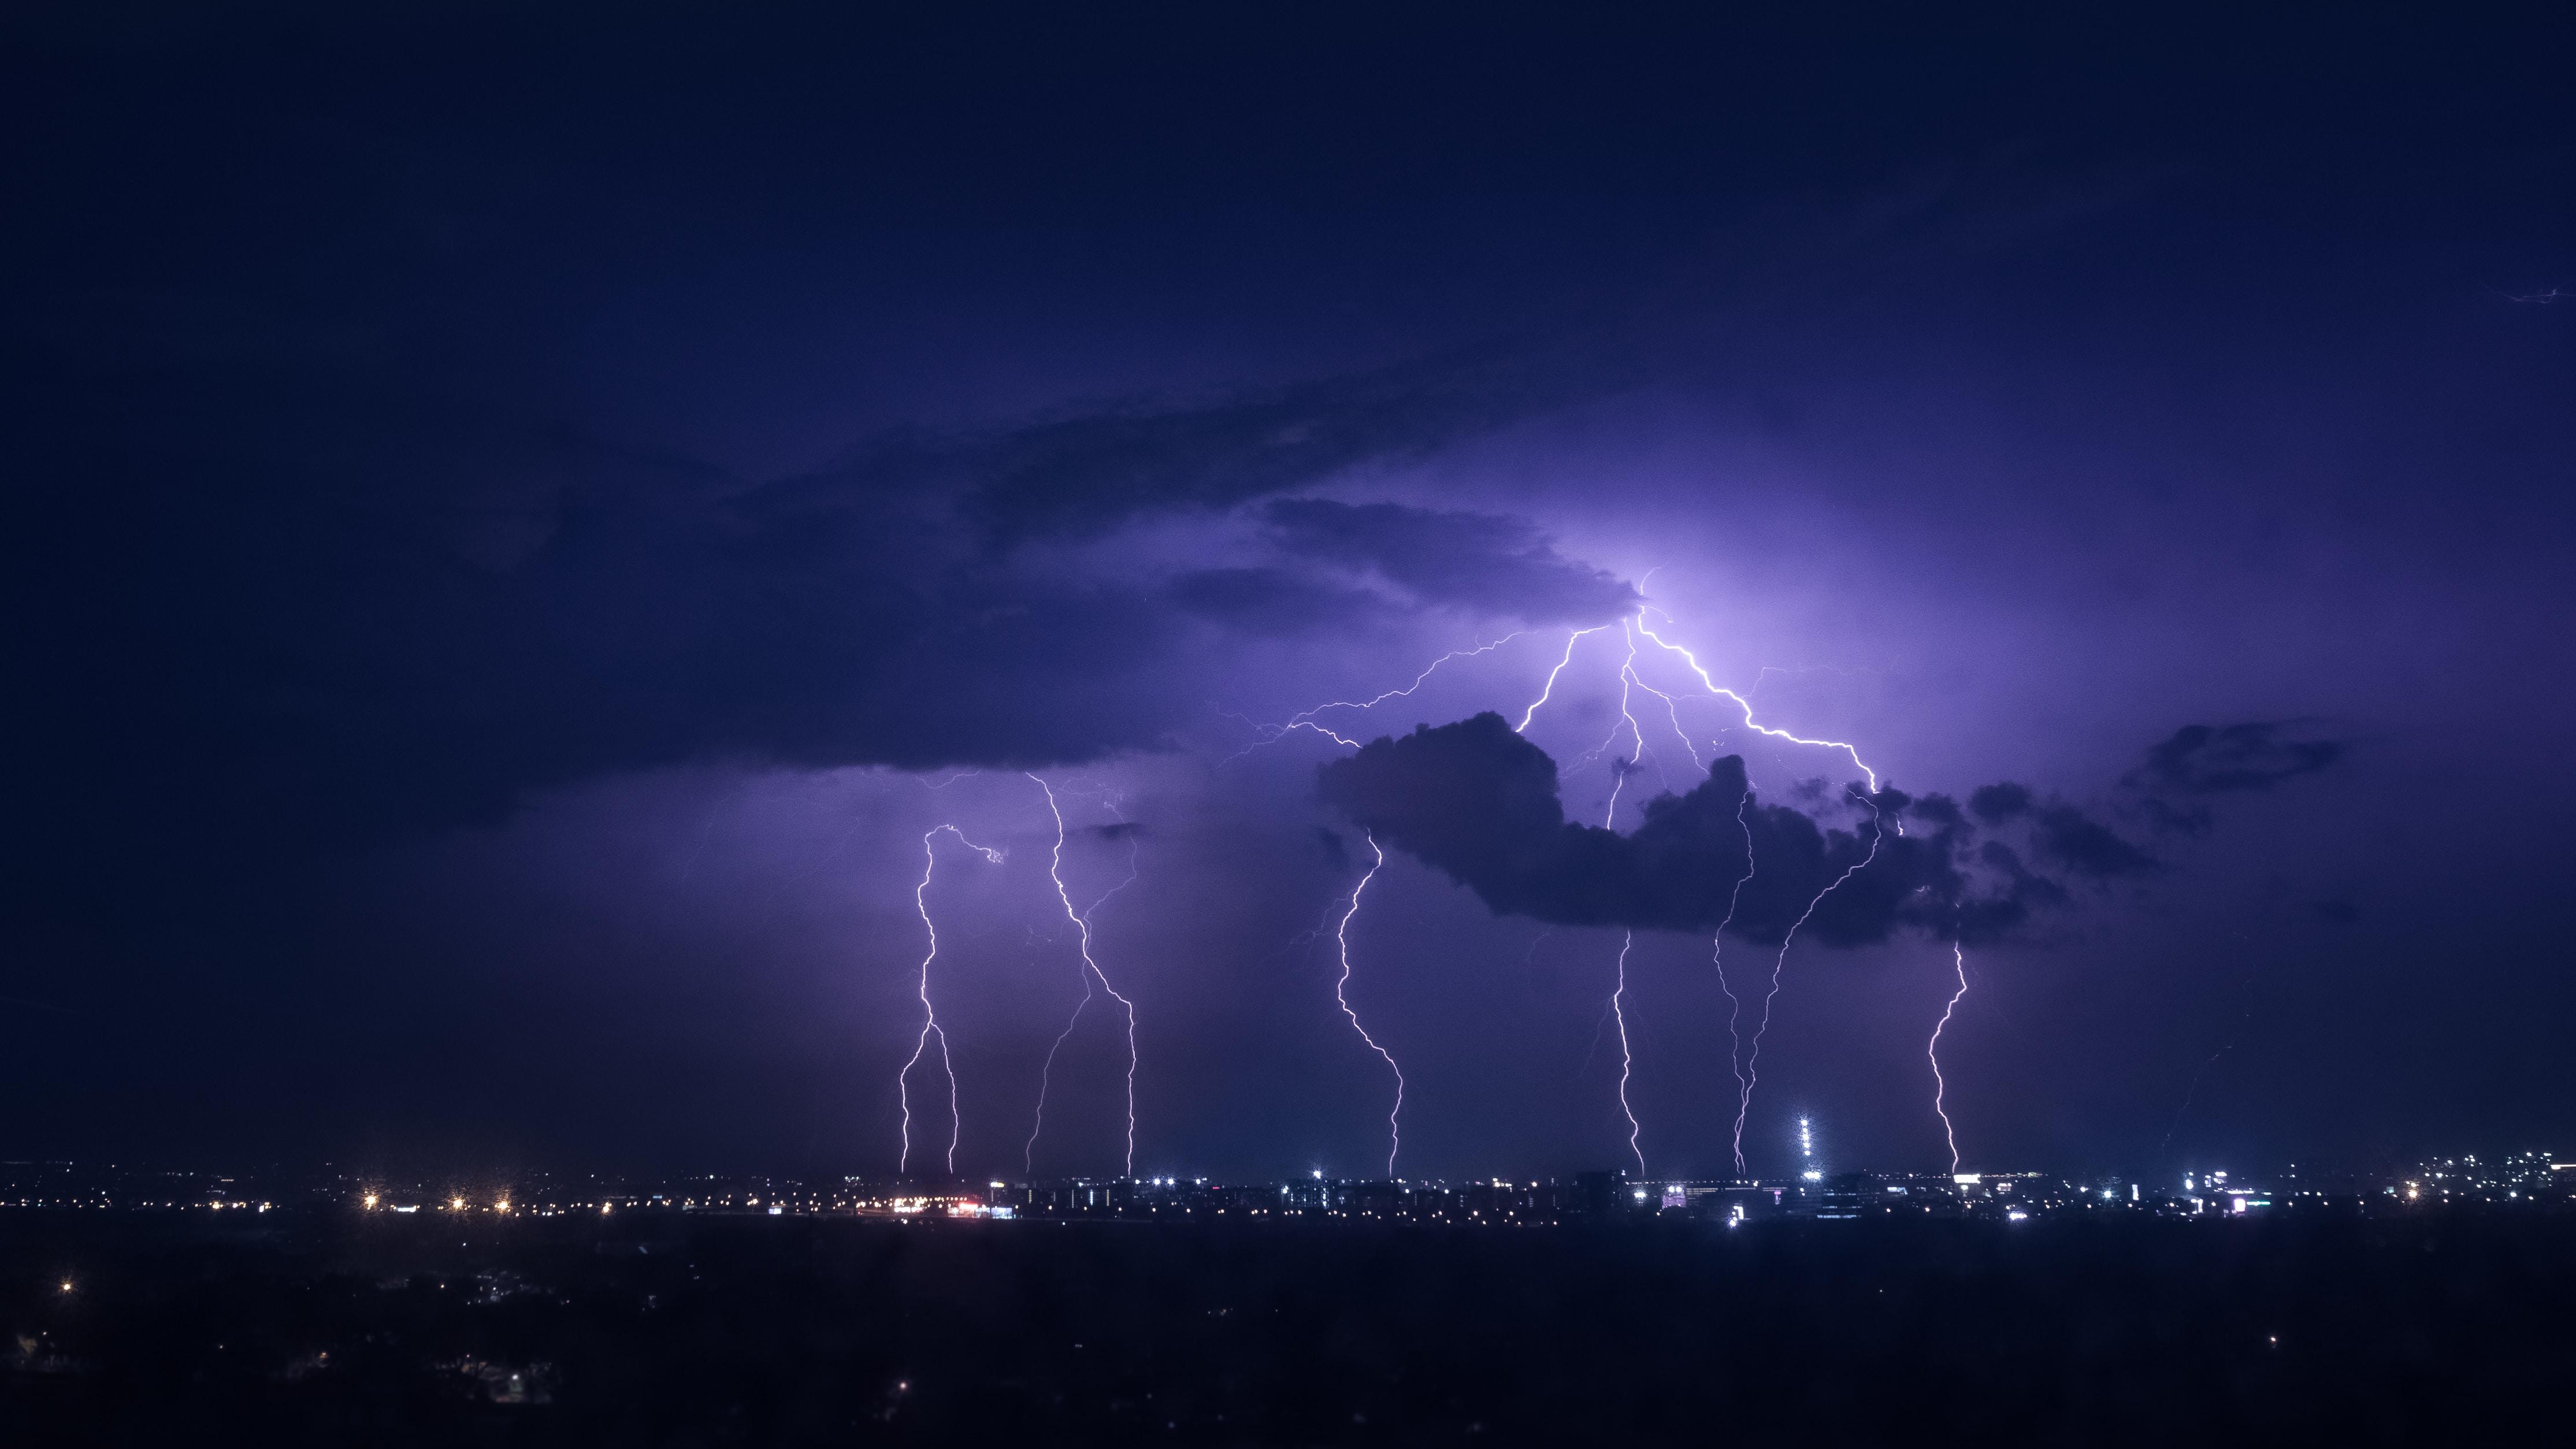 lightning at night time